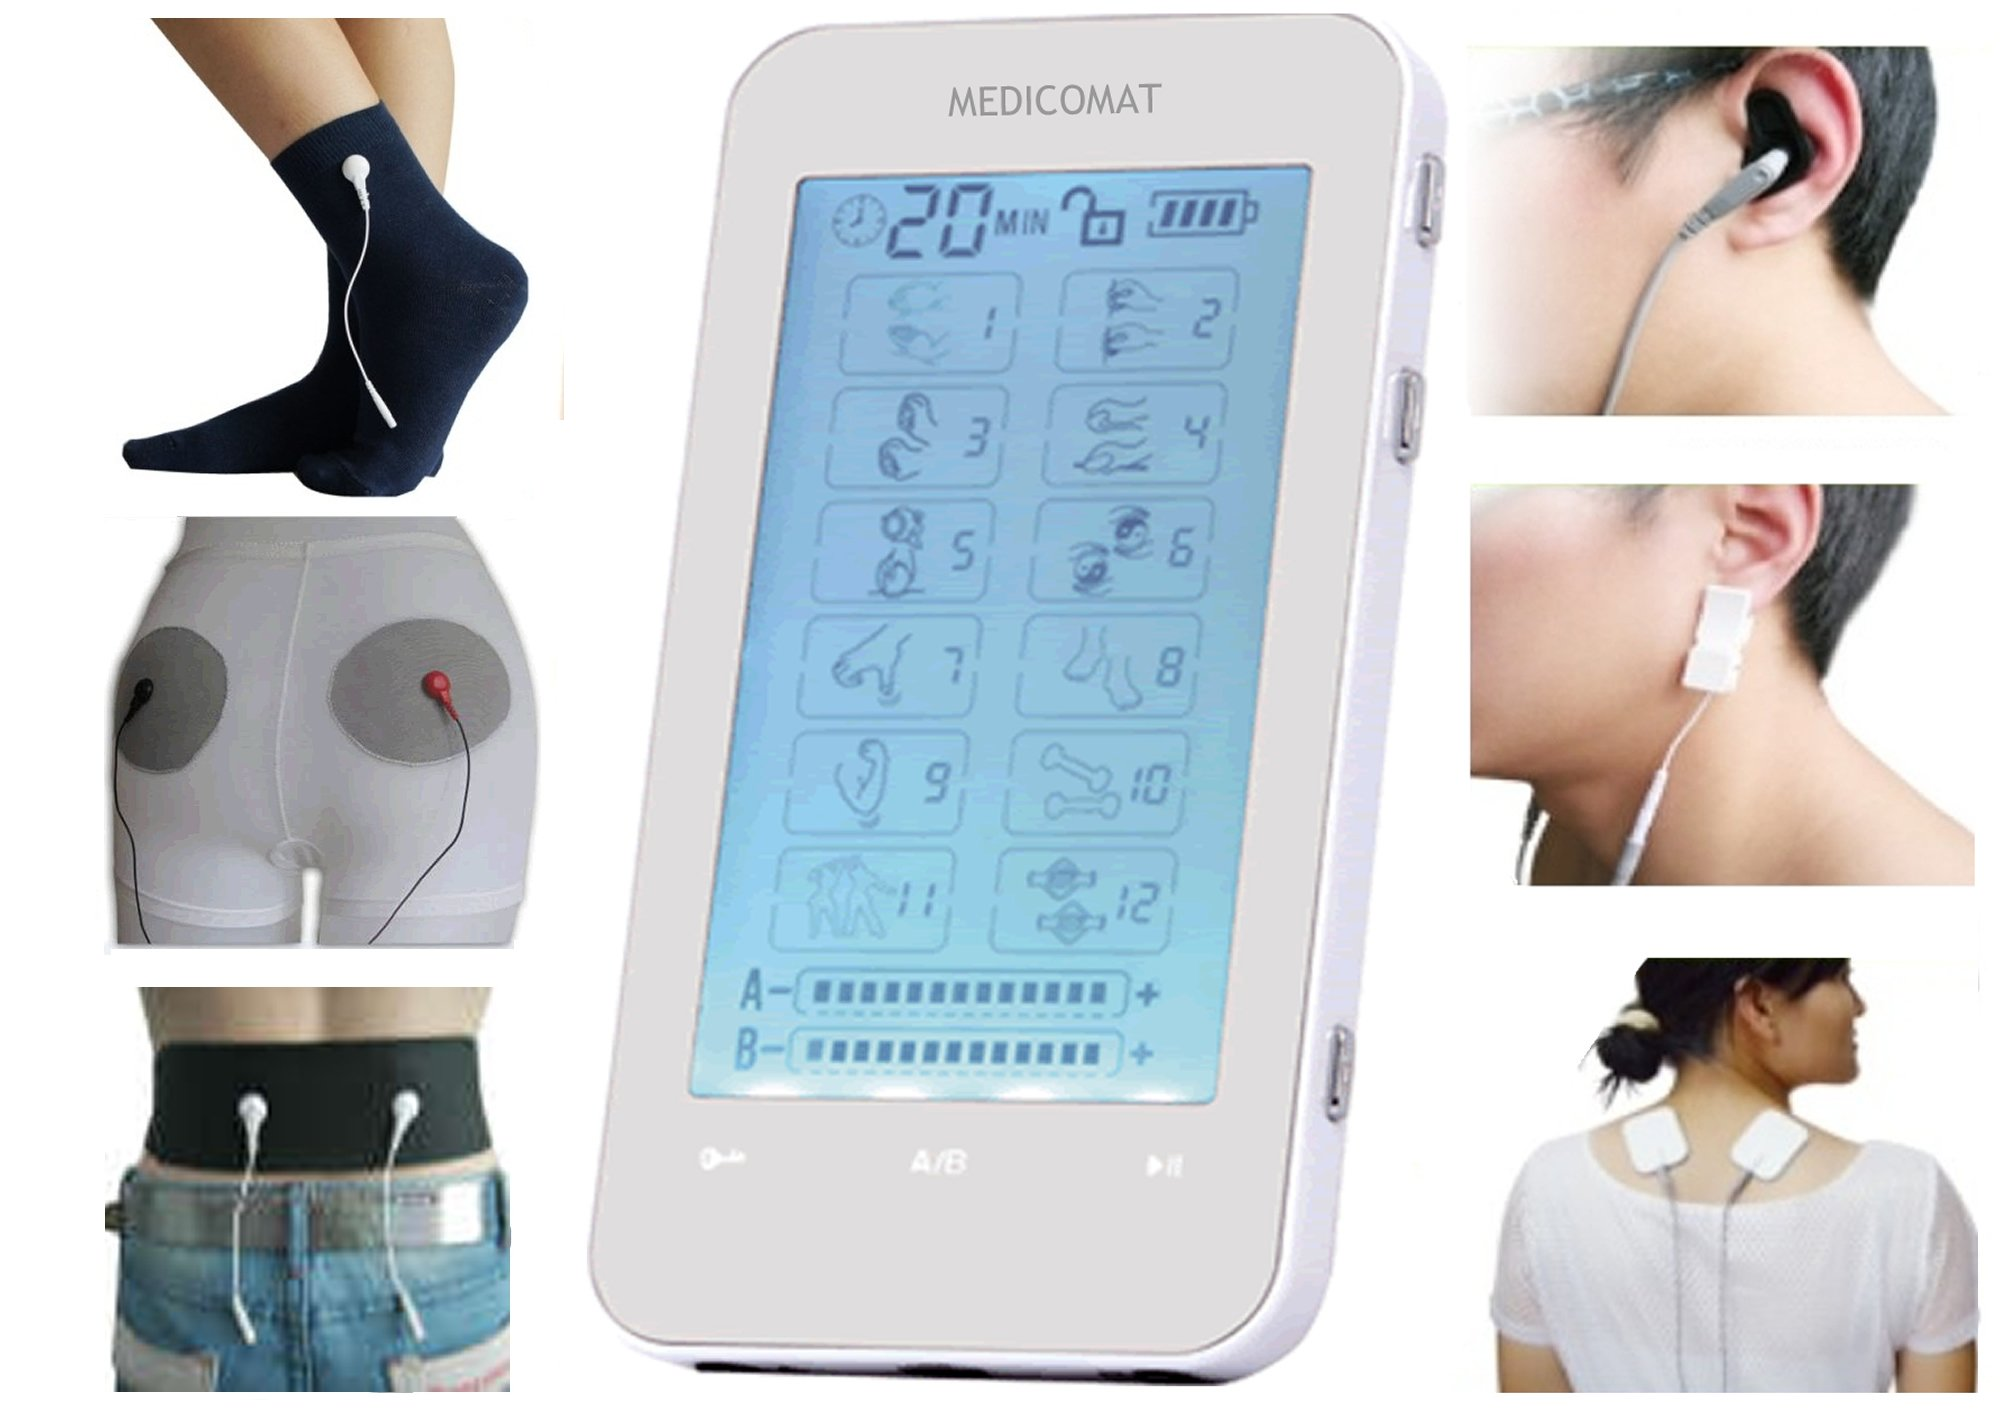 Back Pain Relief Medicomat Rechargeable Touchscreen Unit (Medicomat-3J with Belt Underpants Socks)